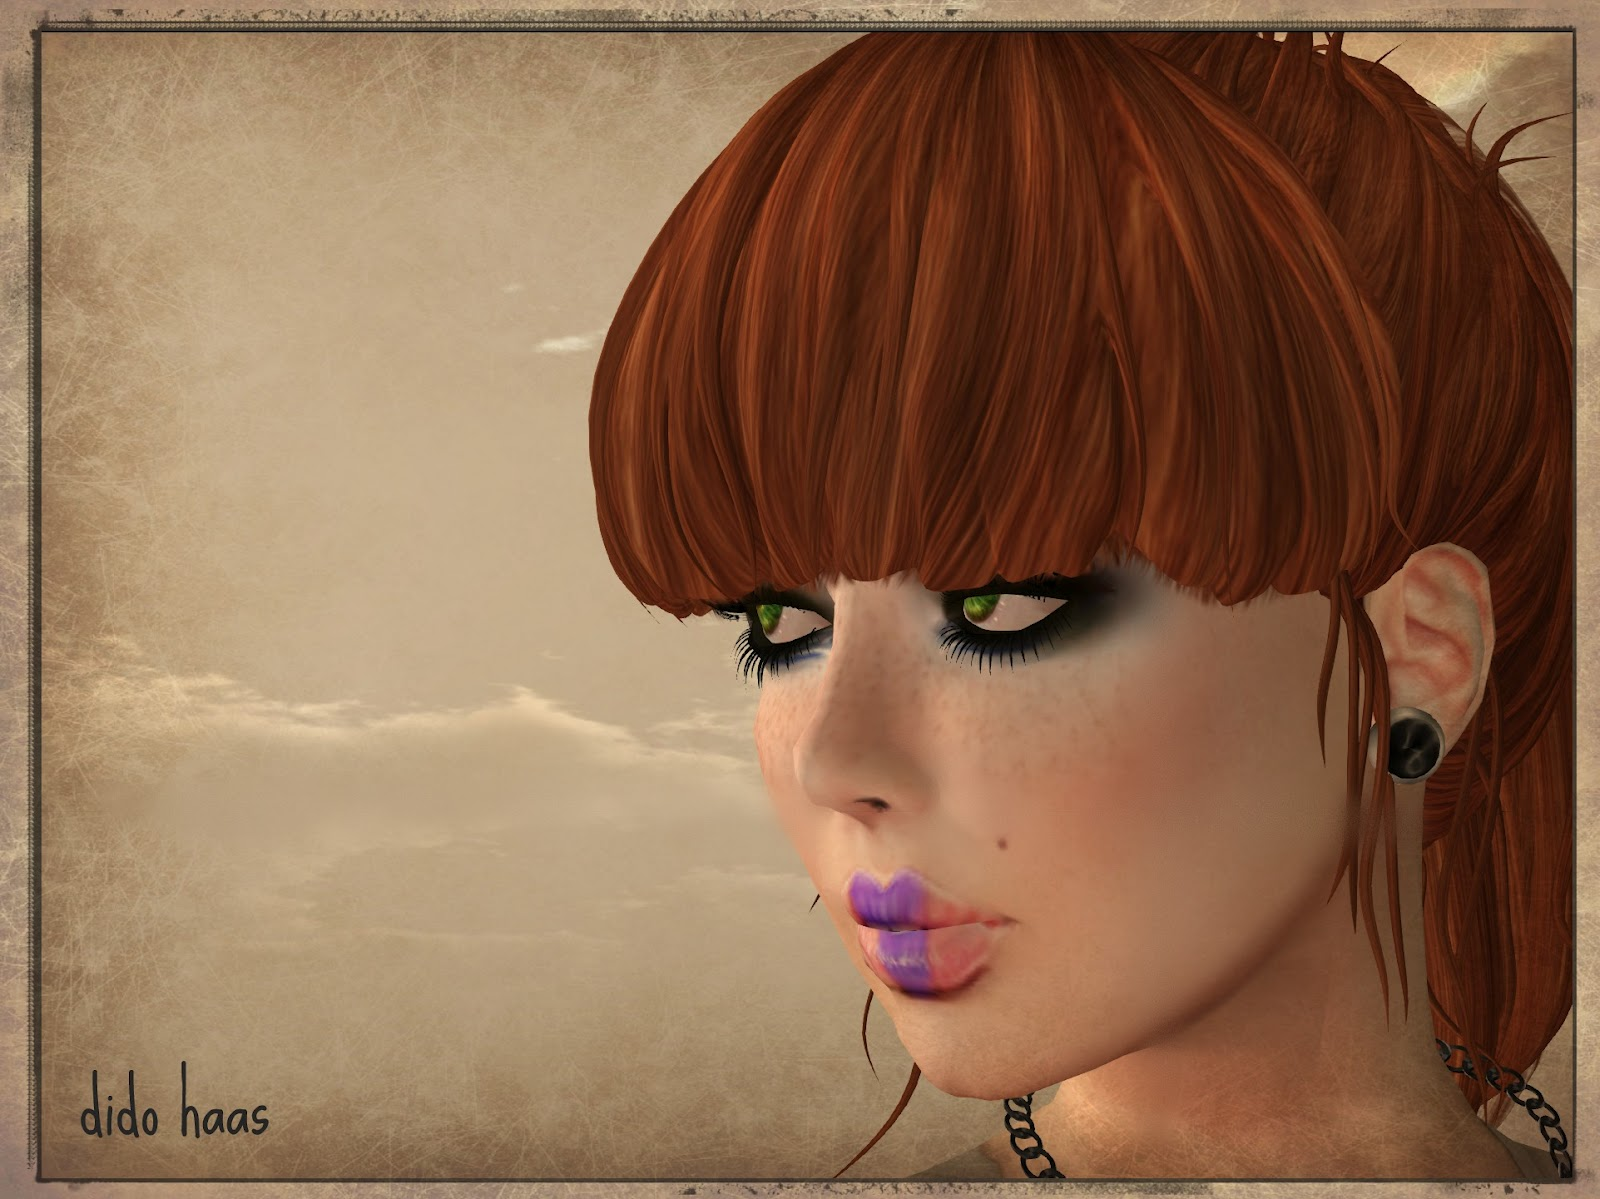 http://4.bp.blogspot.com/-gt_98HH_DCY/UCmhjLzFVpI/AAAAAAAAHCM/Io6Q4P2ZRBA/s1600/Modish+skin+Aug+GG.jpg